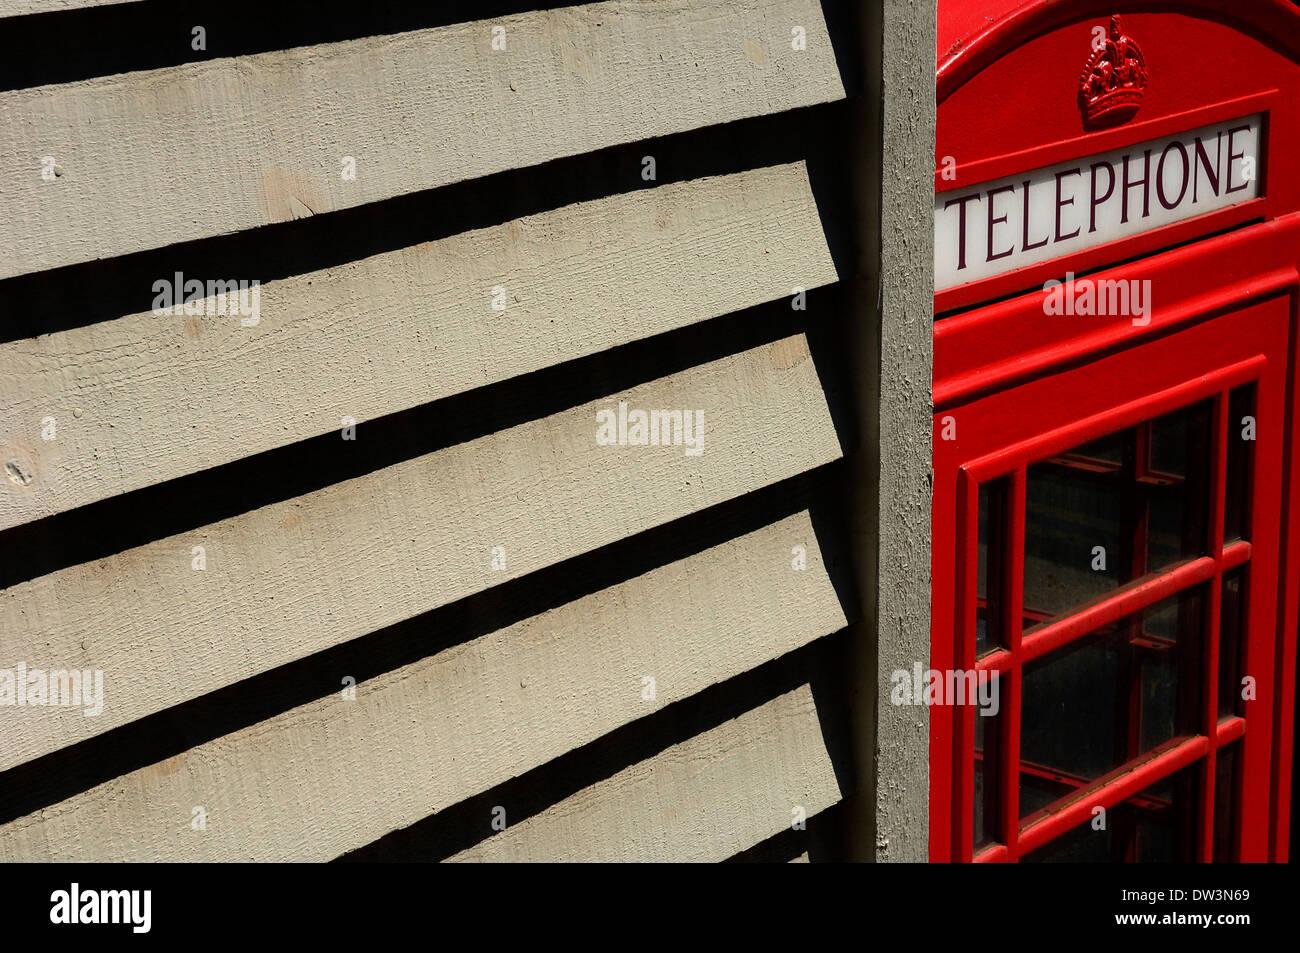 Red telephone box - Stock Image